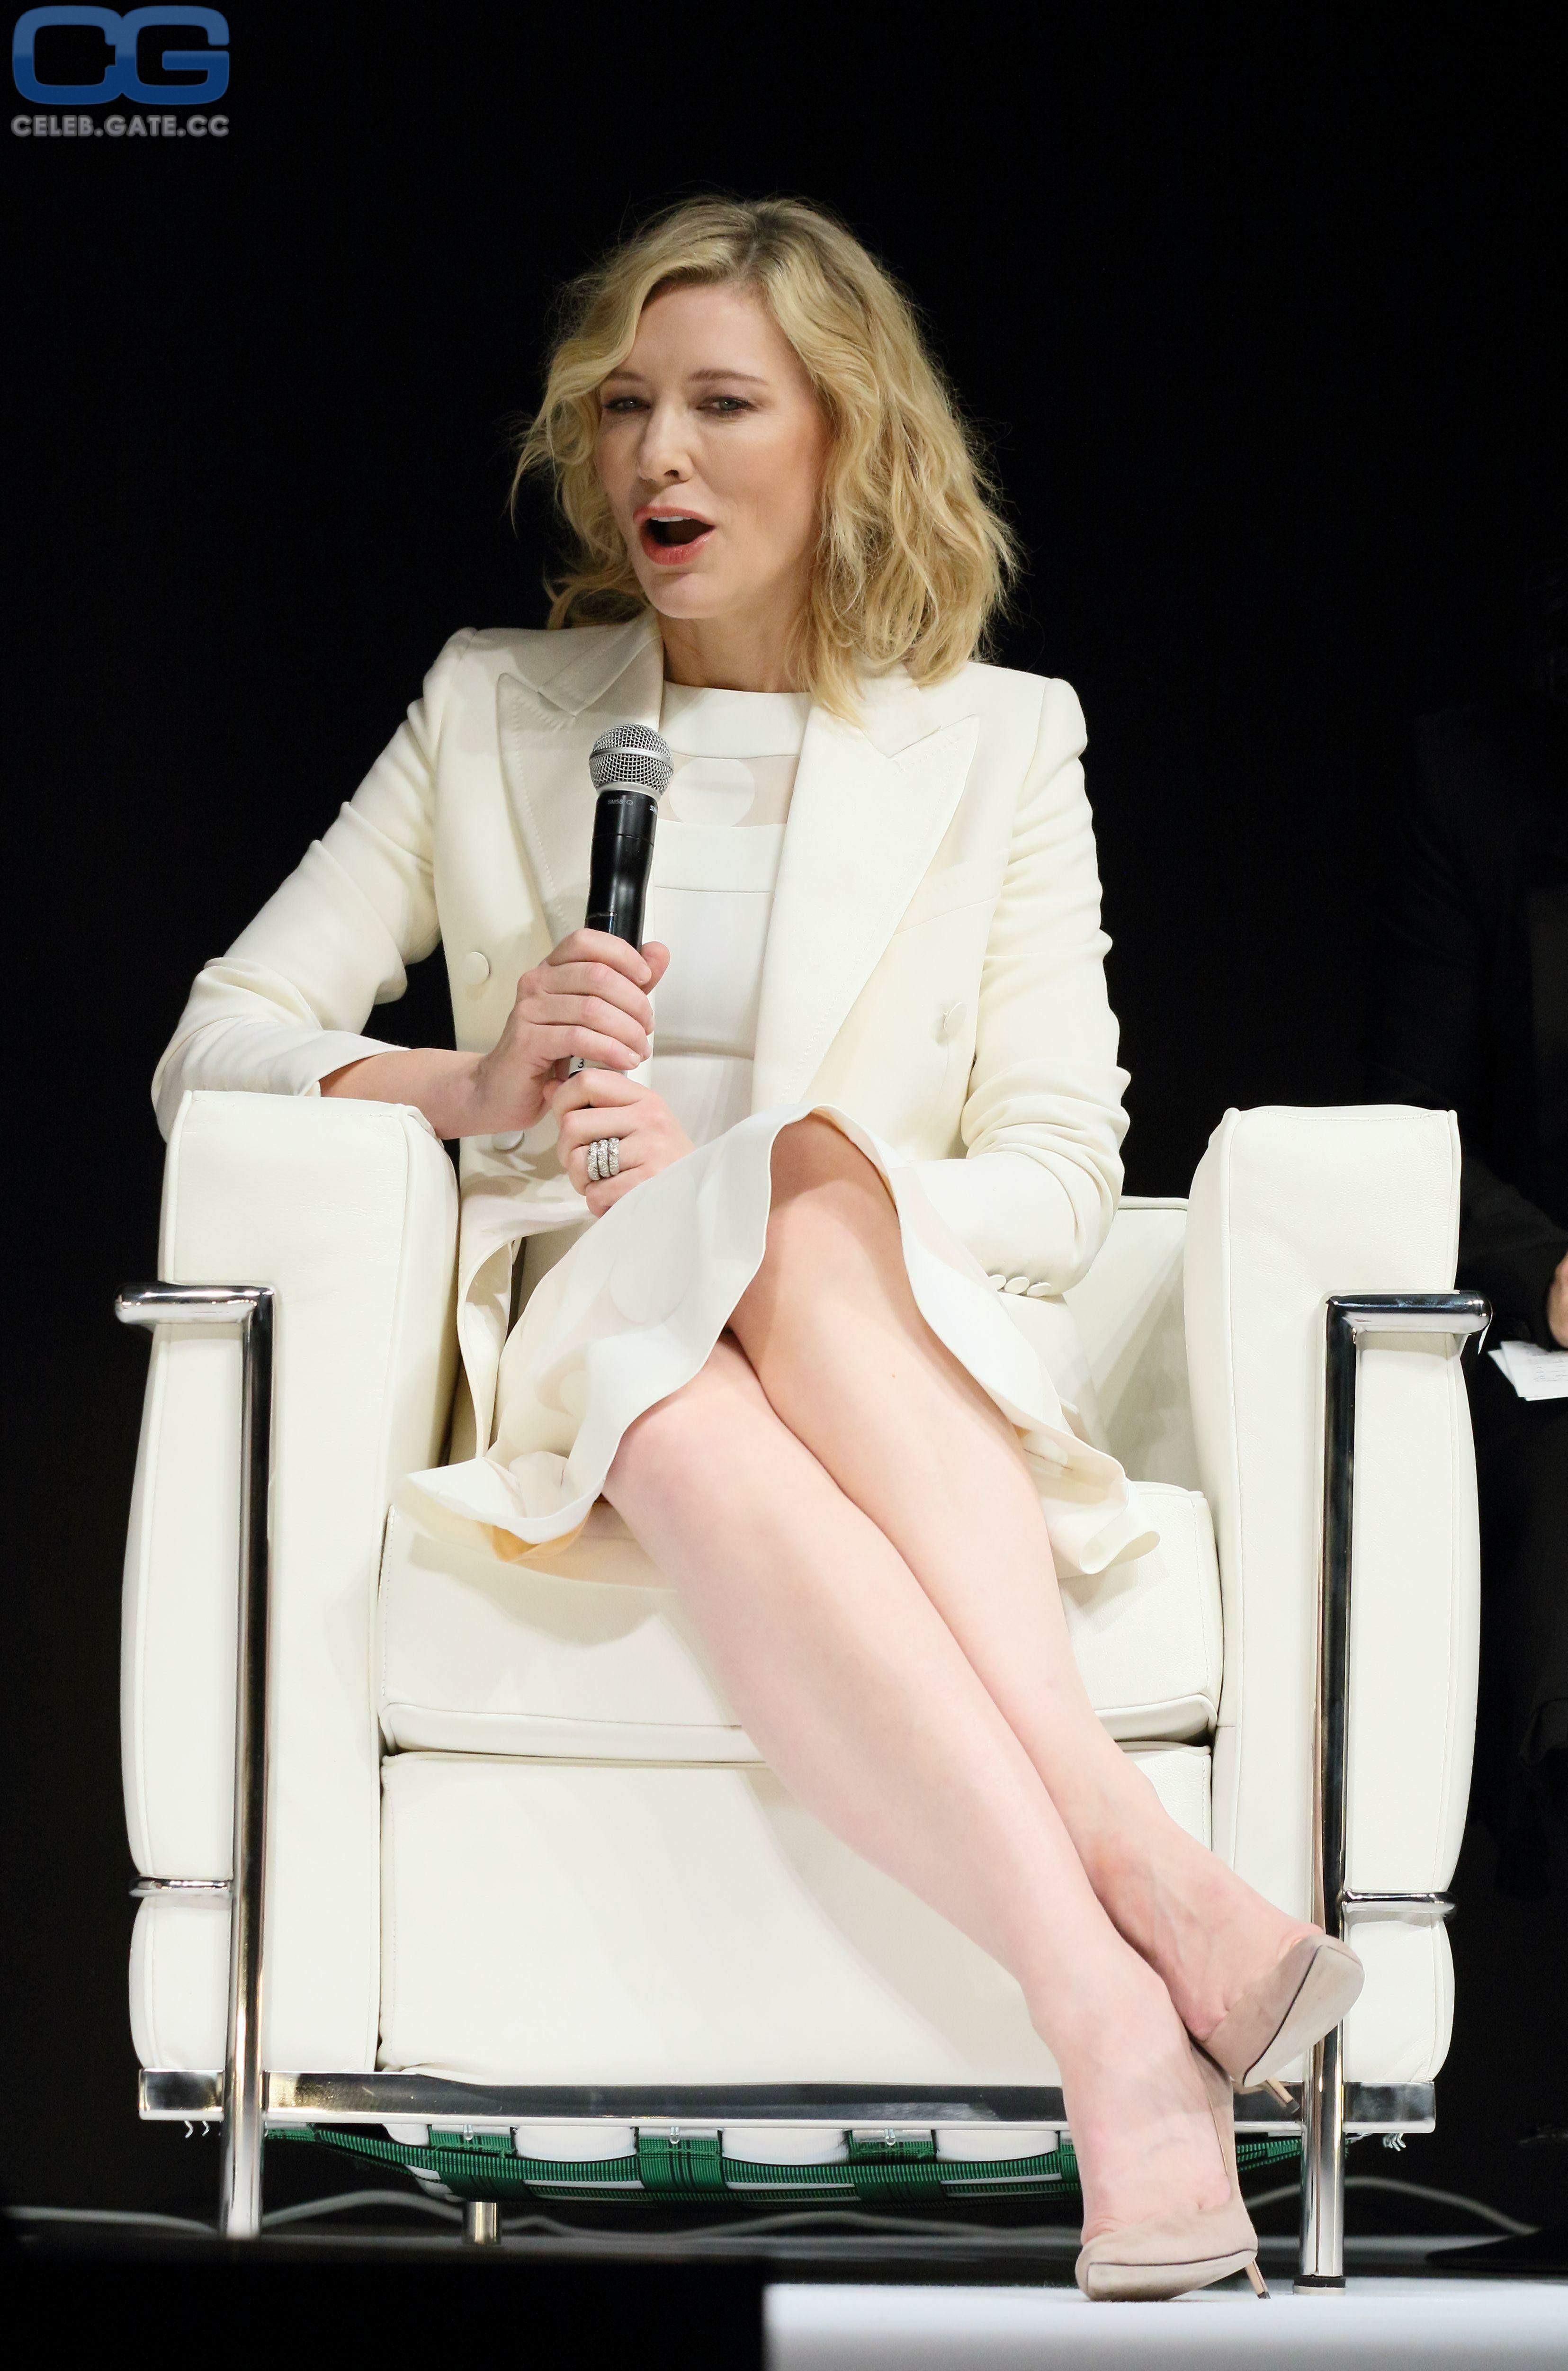 Cate nackt Blanchett Redbubble logo